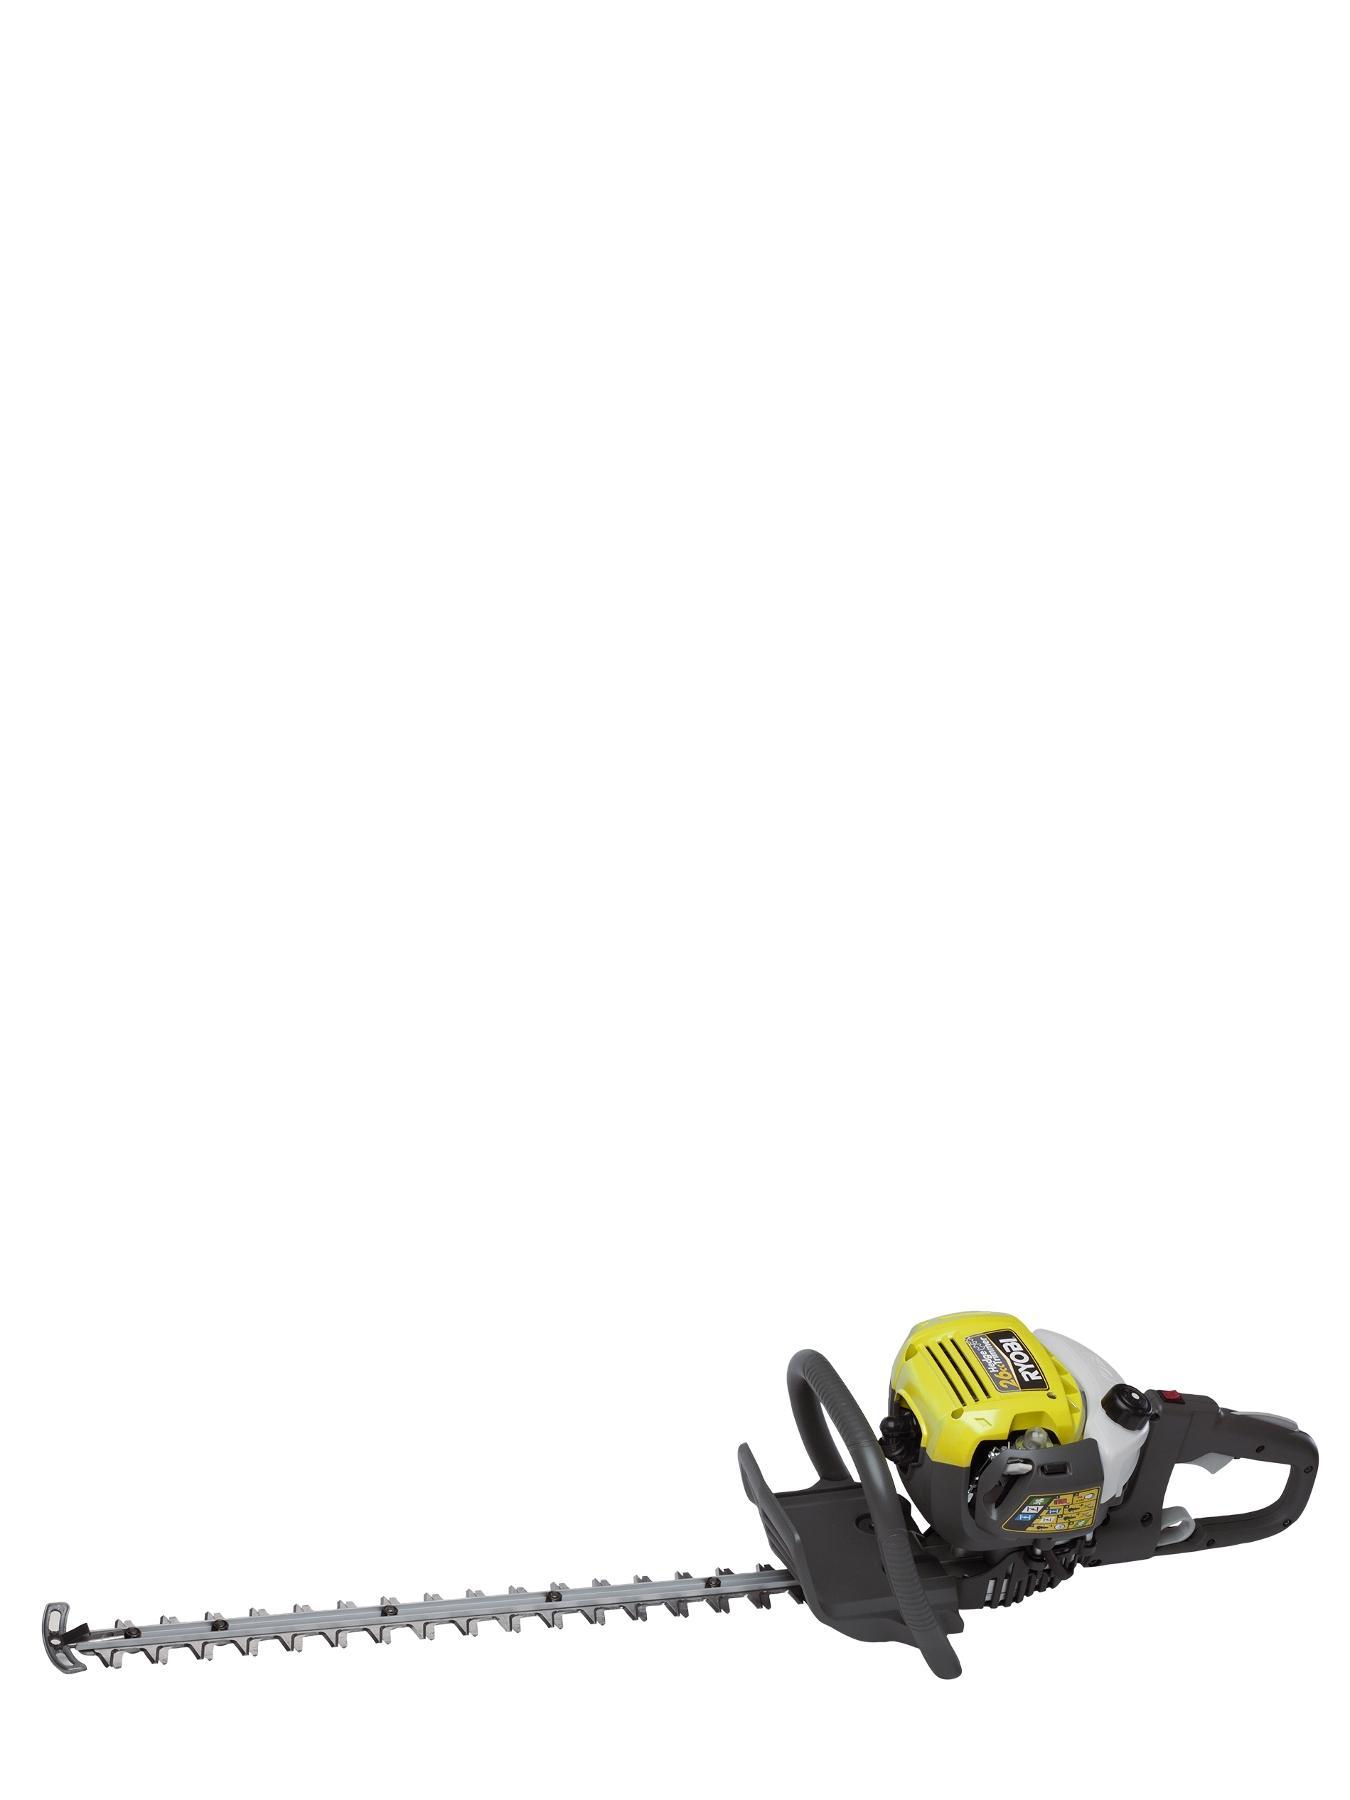 RYOBI RHT2660R 26cc Petrol Hedge Trimmer